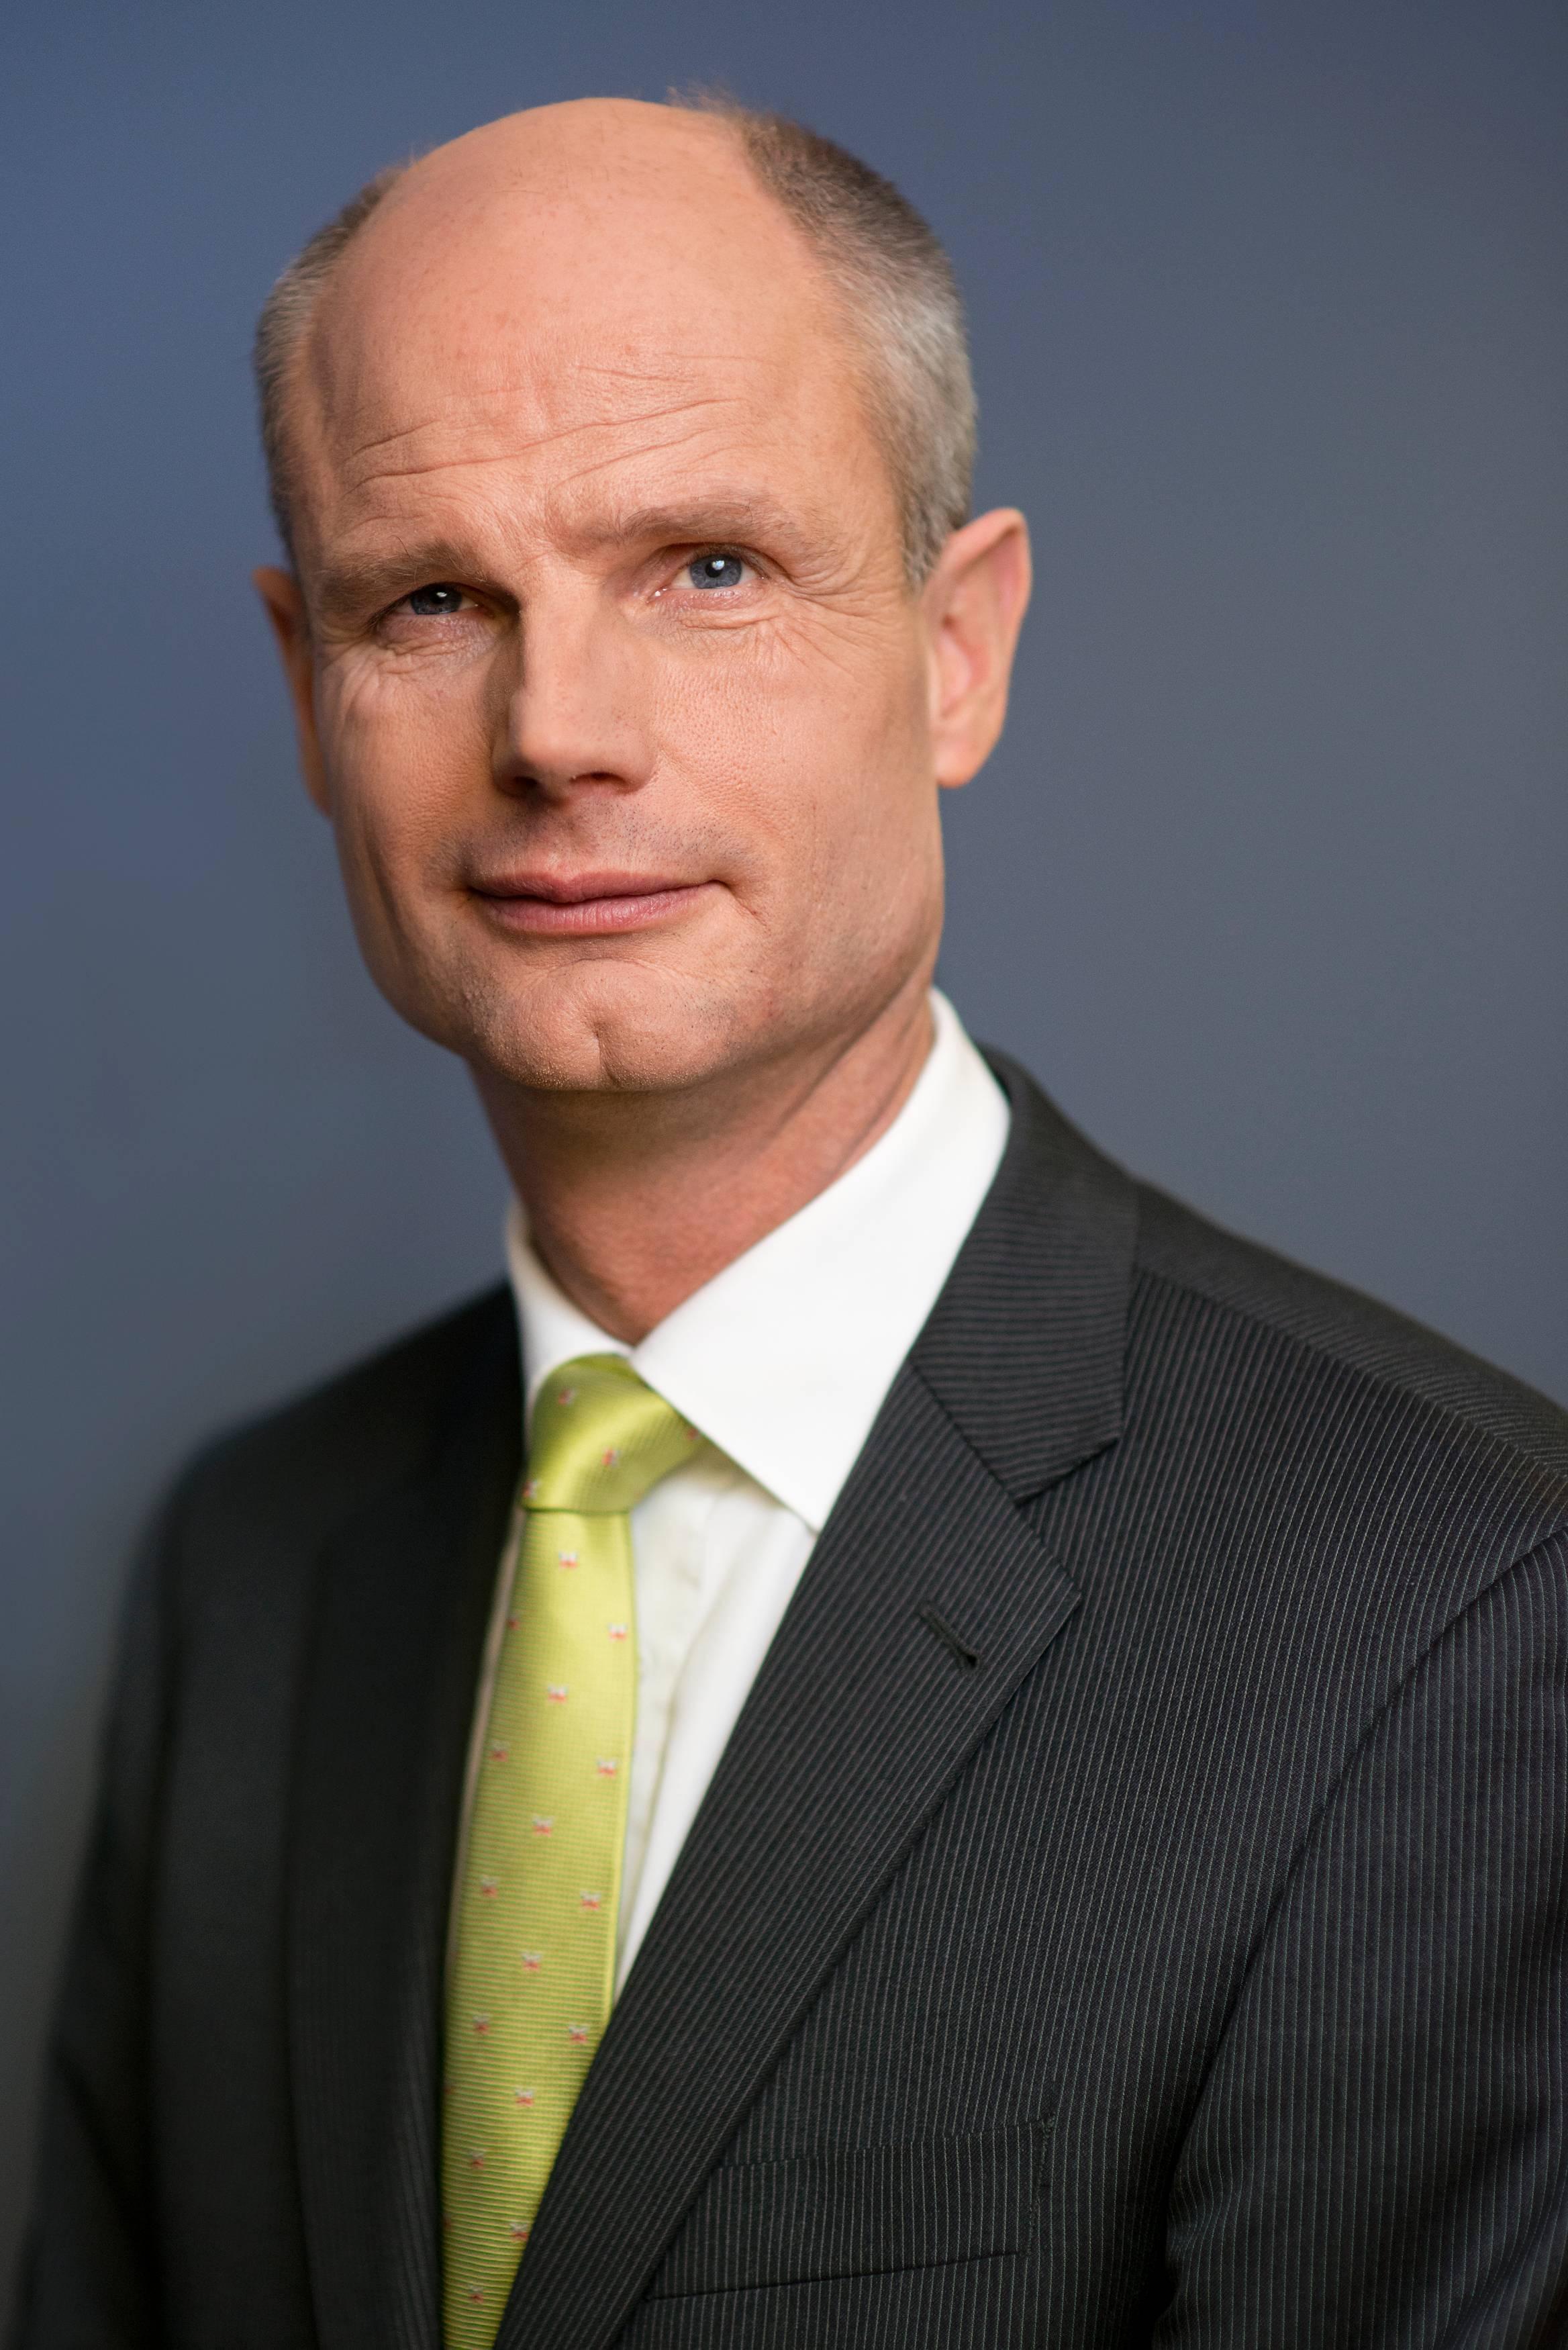 Minister Stef Blok